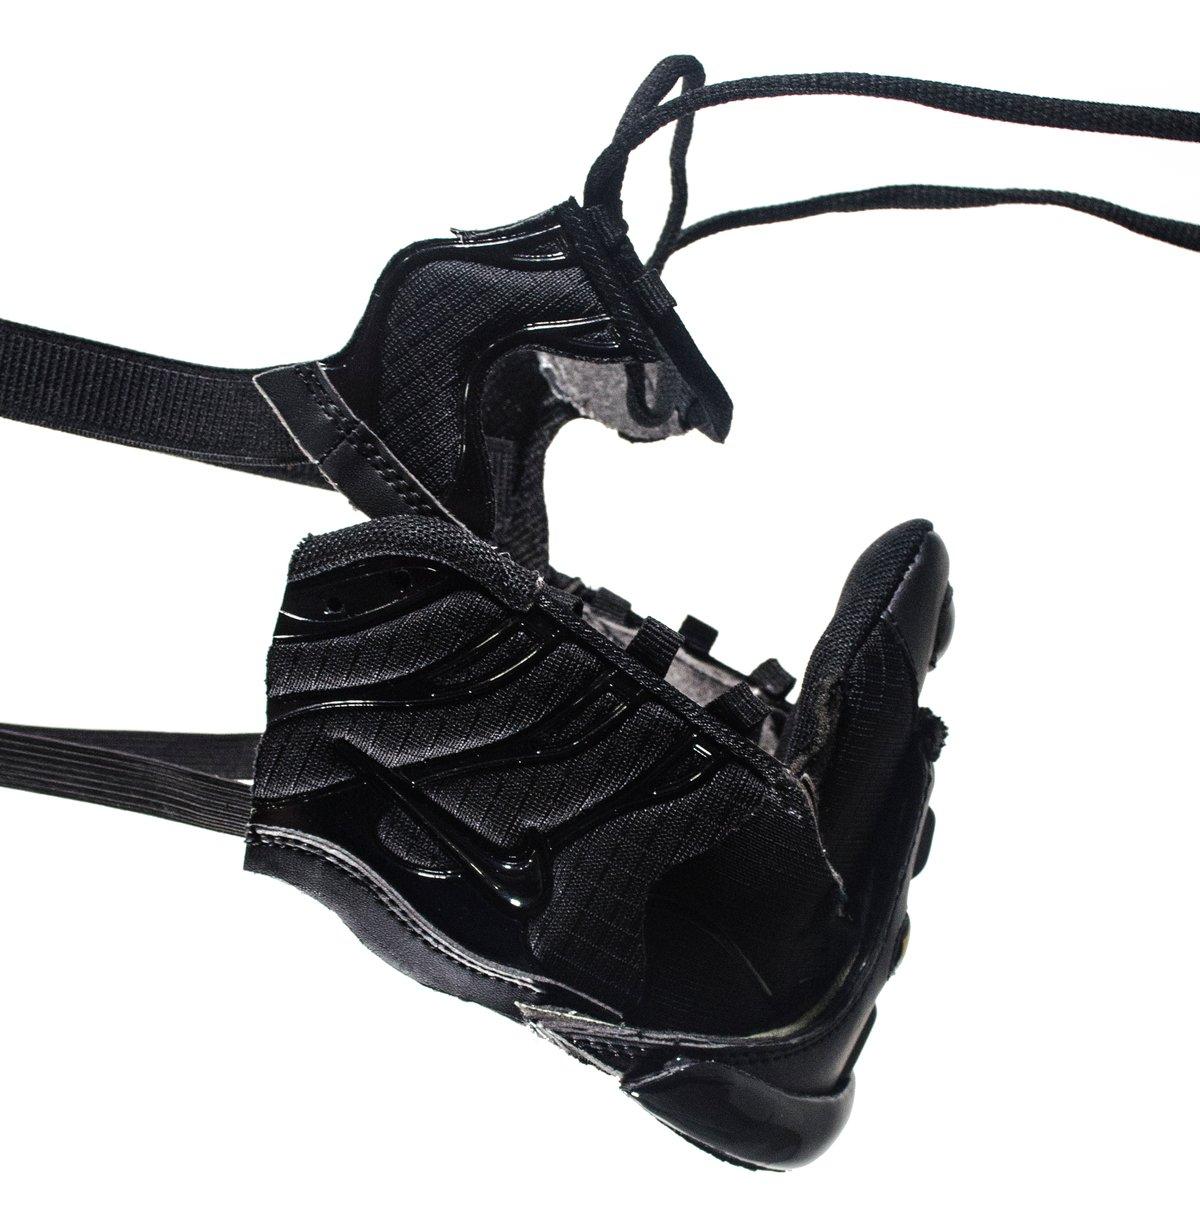 Image of SNEAKER MASK - / BLACK - BLACK / - HEAD PIECE